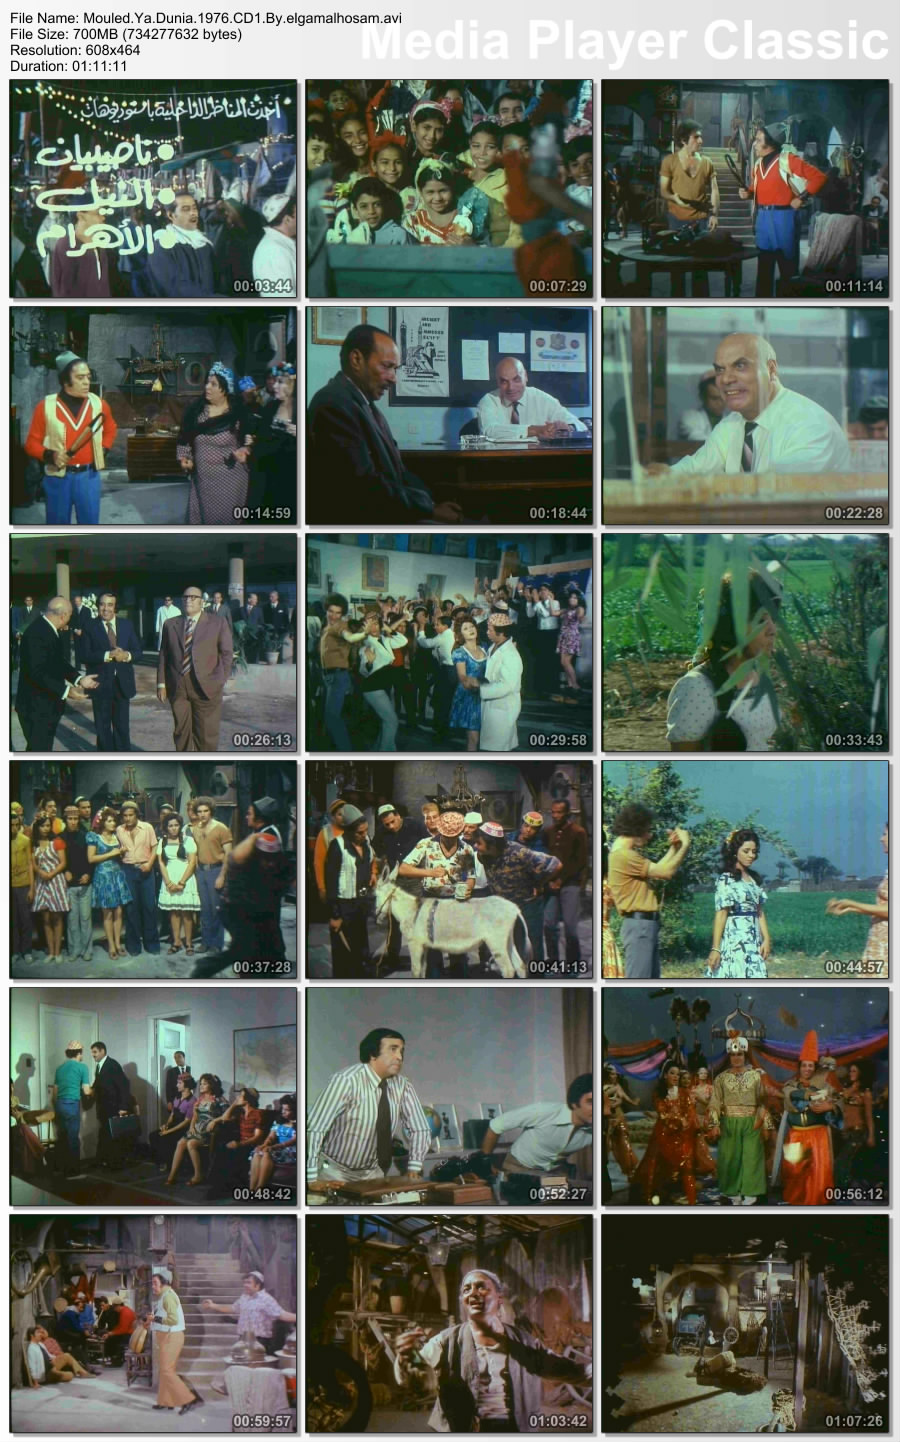 فيلم مولد يادنيا 1976 محمود ljt3fy7qlapcy70u3o09.jpg